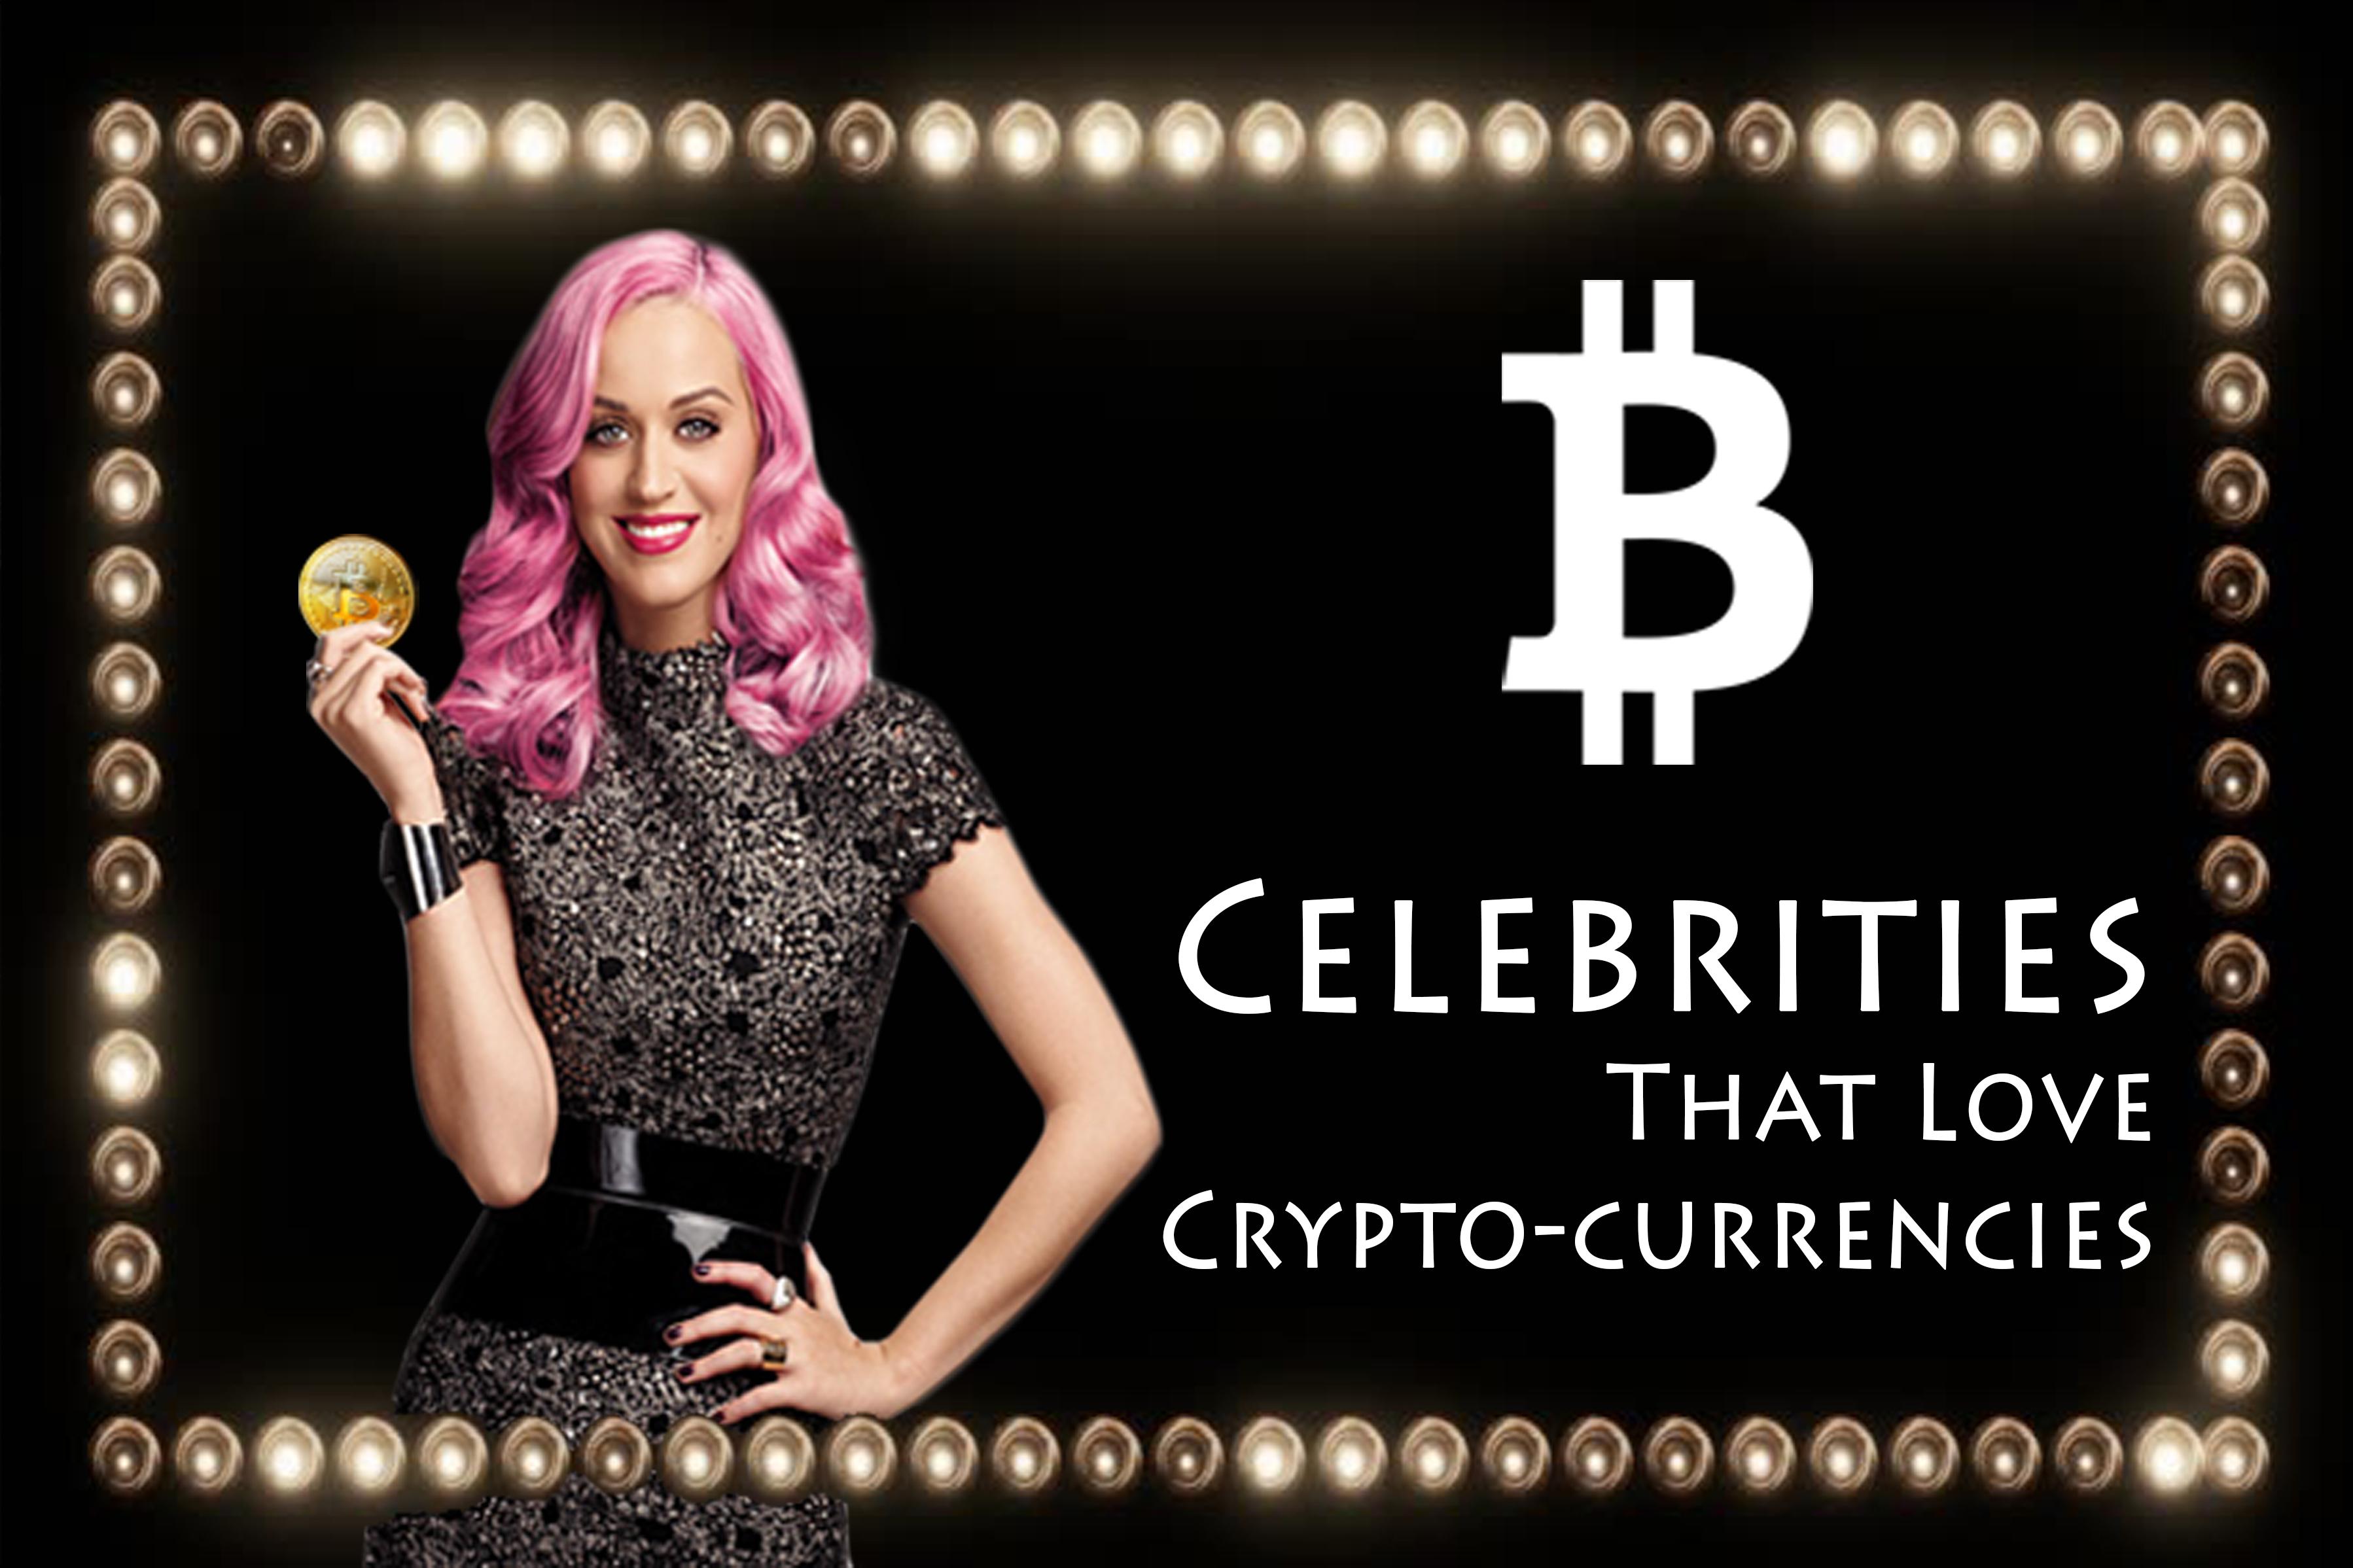 Celebrities_That_Love_Cryptocurrencies